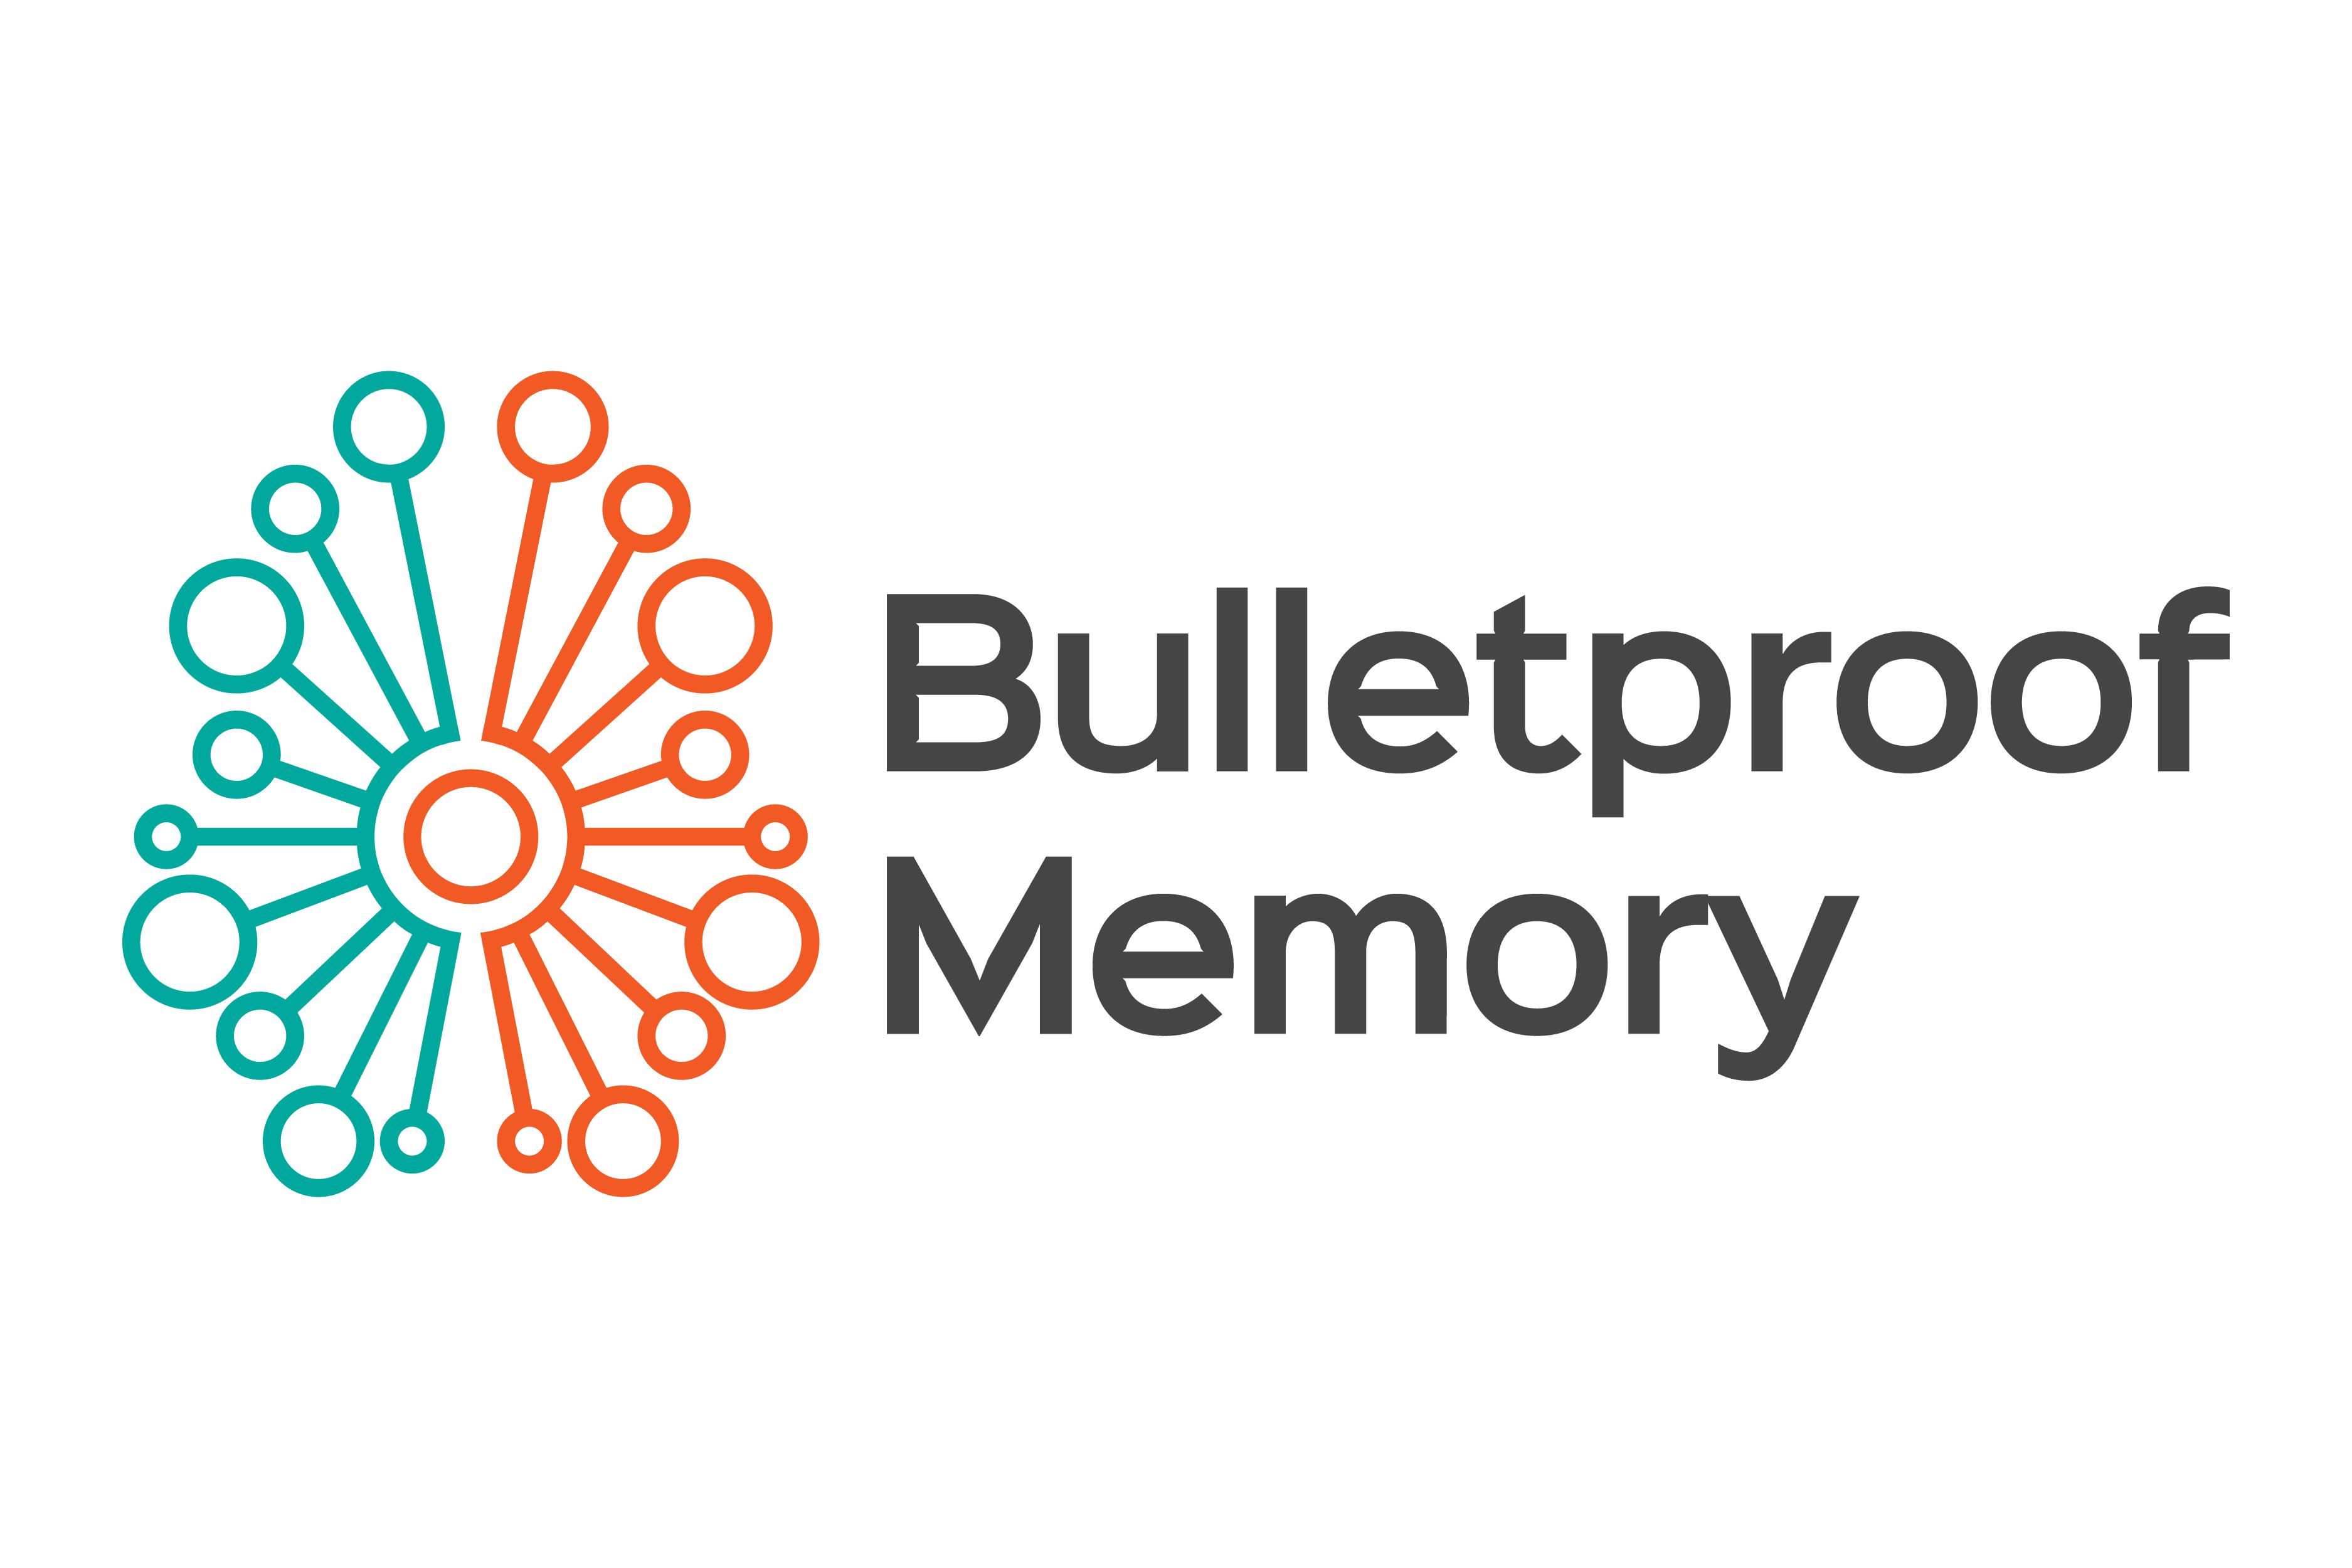 New pills for memory loss image 1